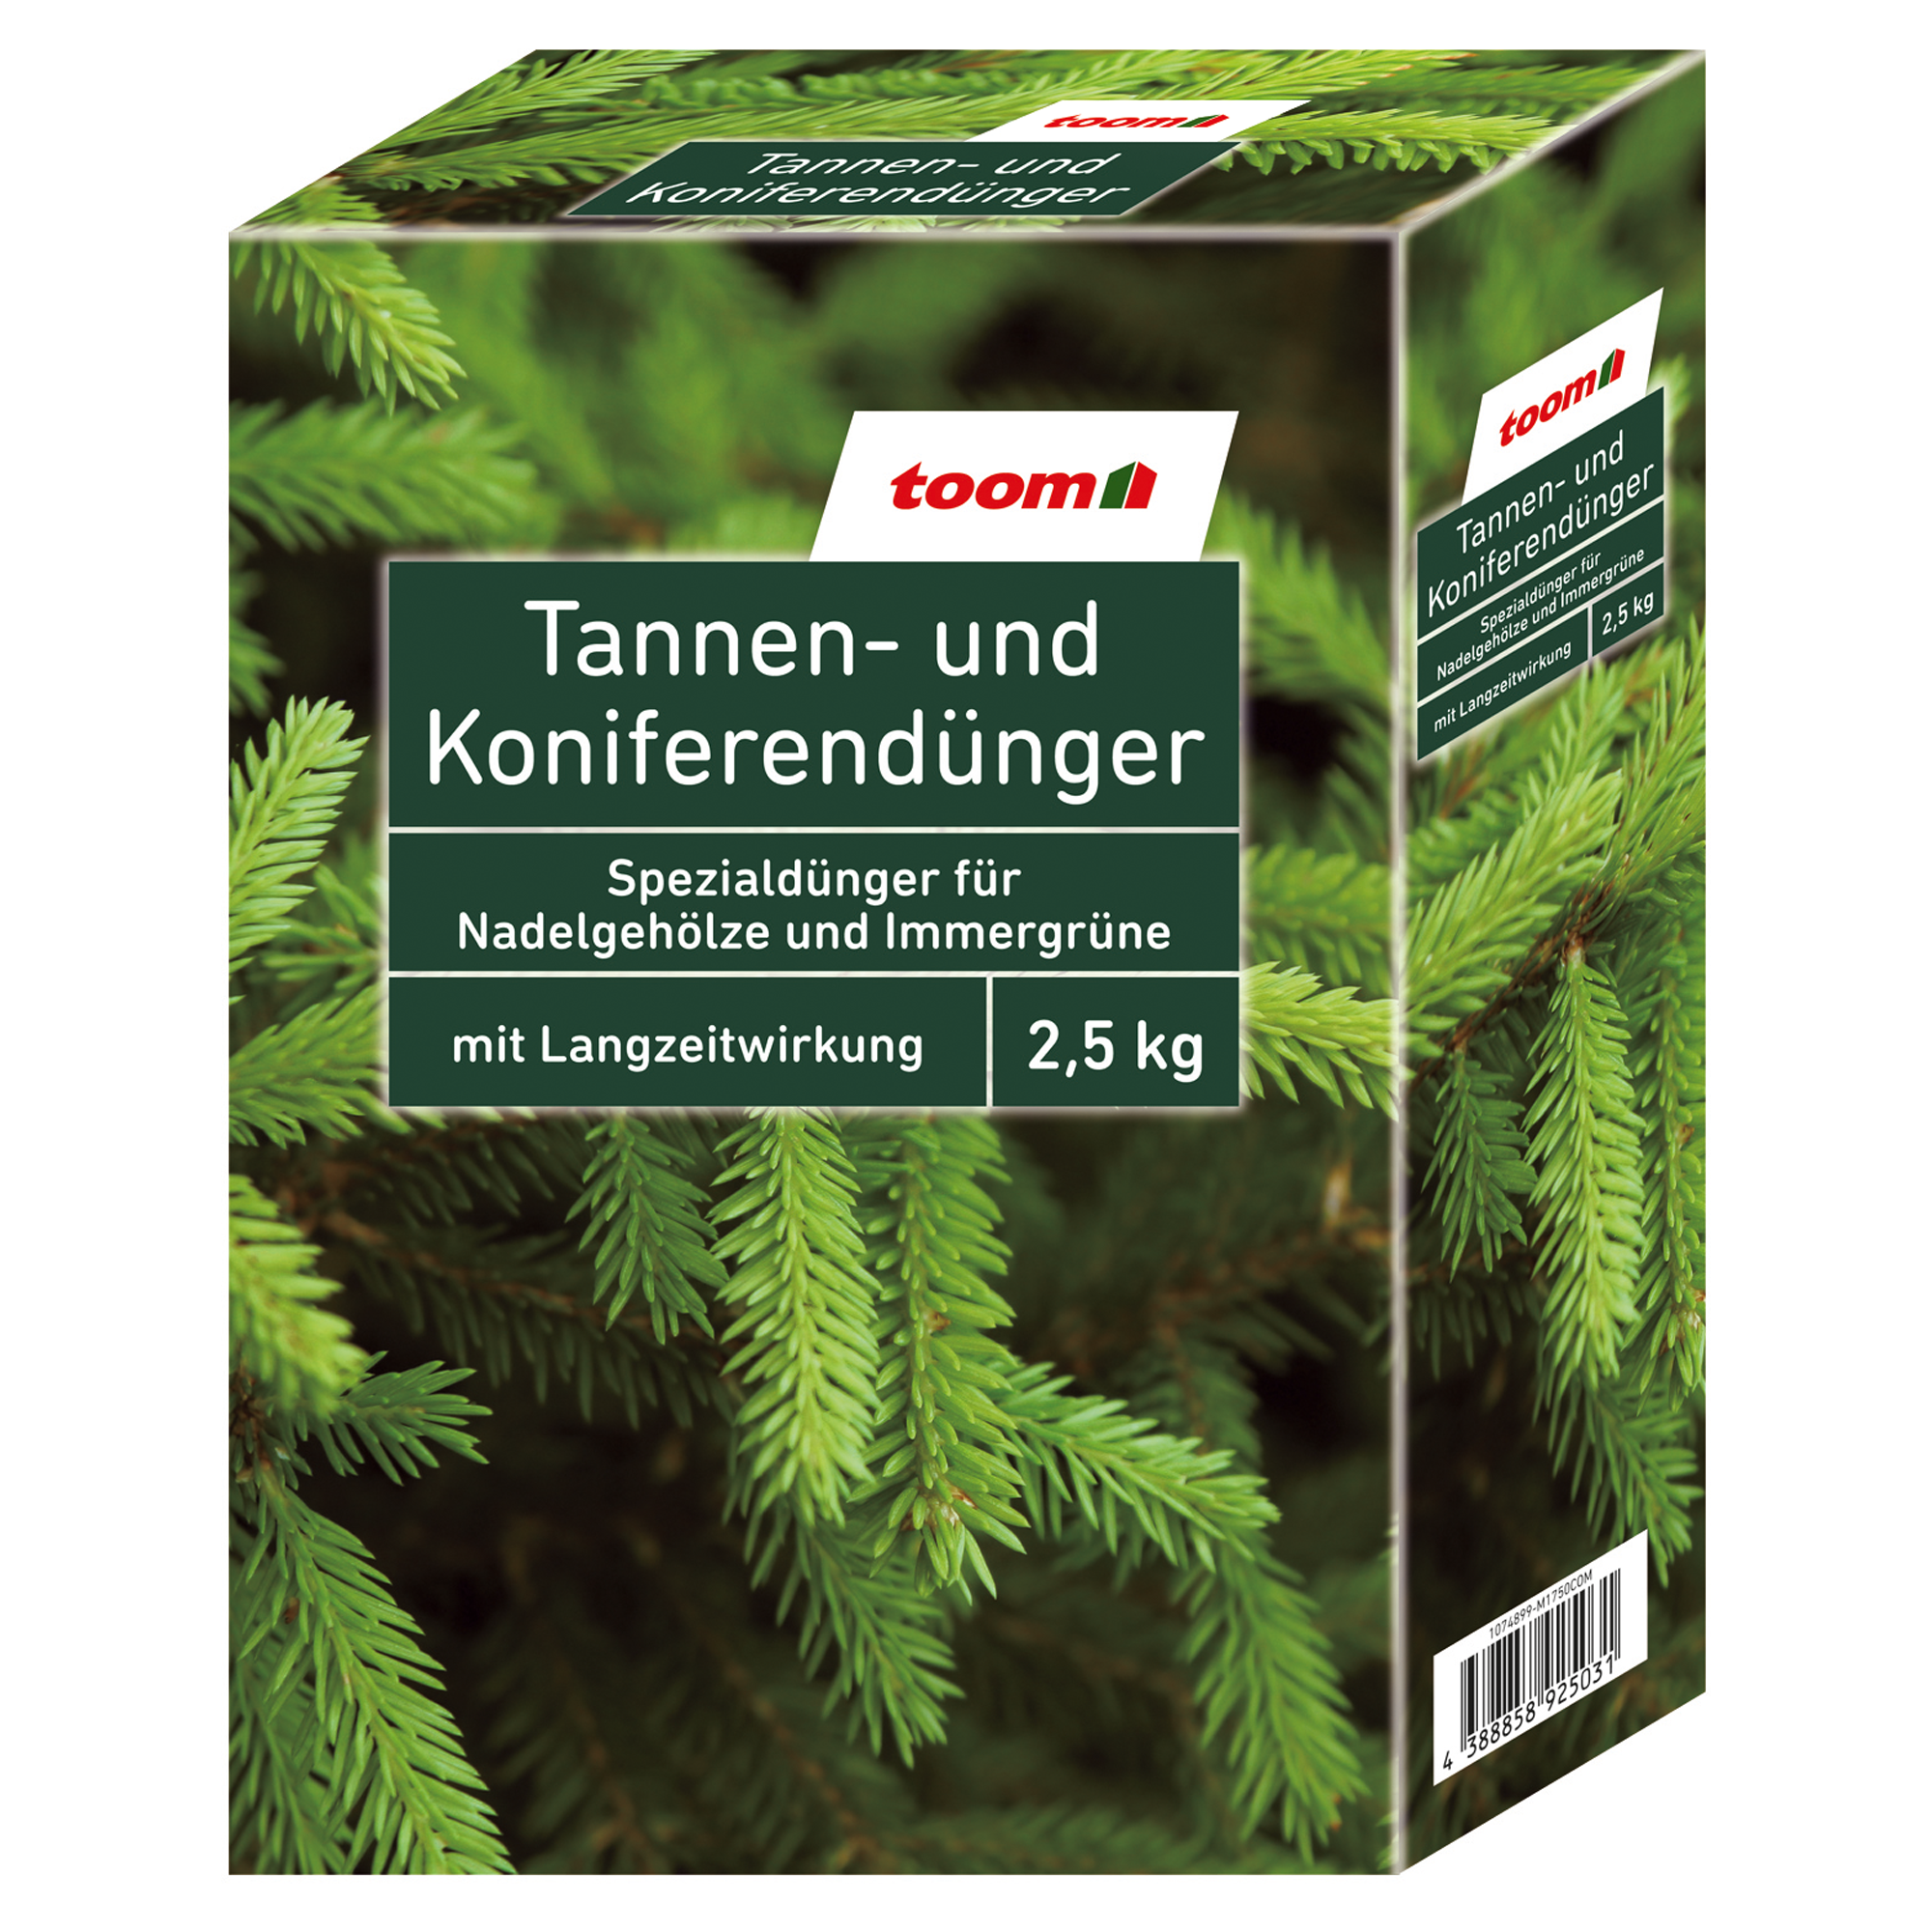 8x Tannen Dünger 2,5kg 1,92€//KG Nadelgehölze Koniferen Dünger